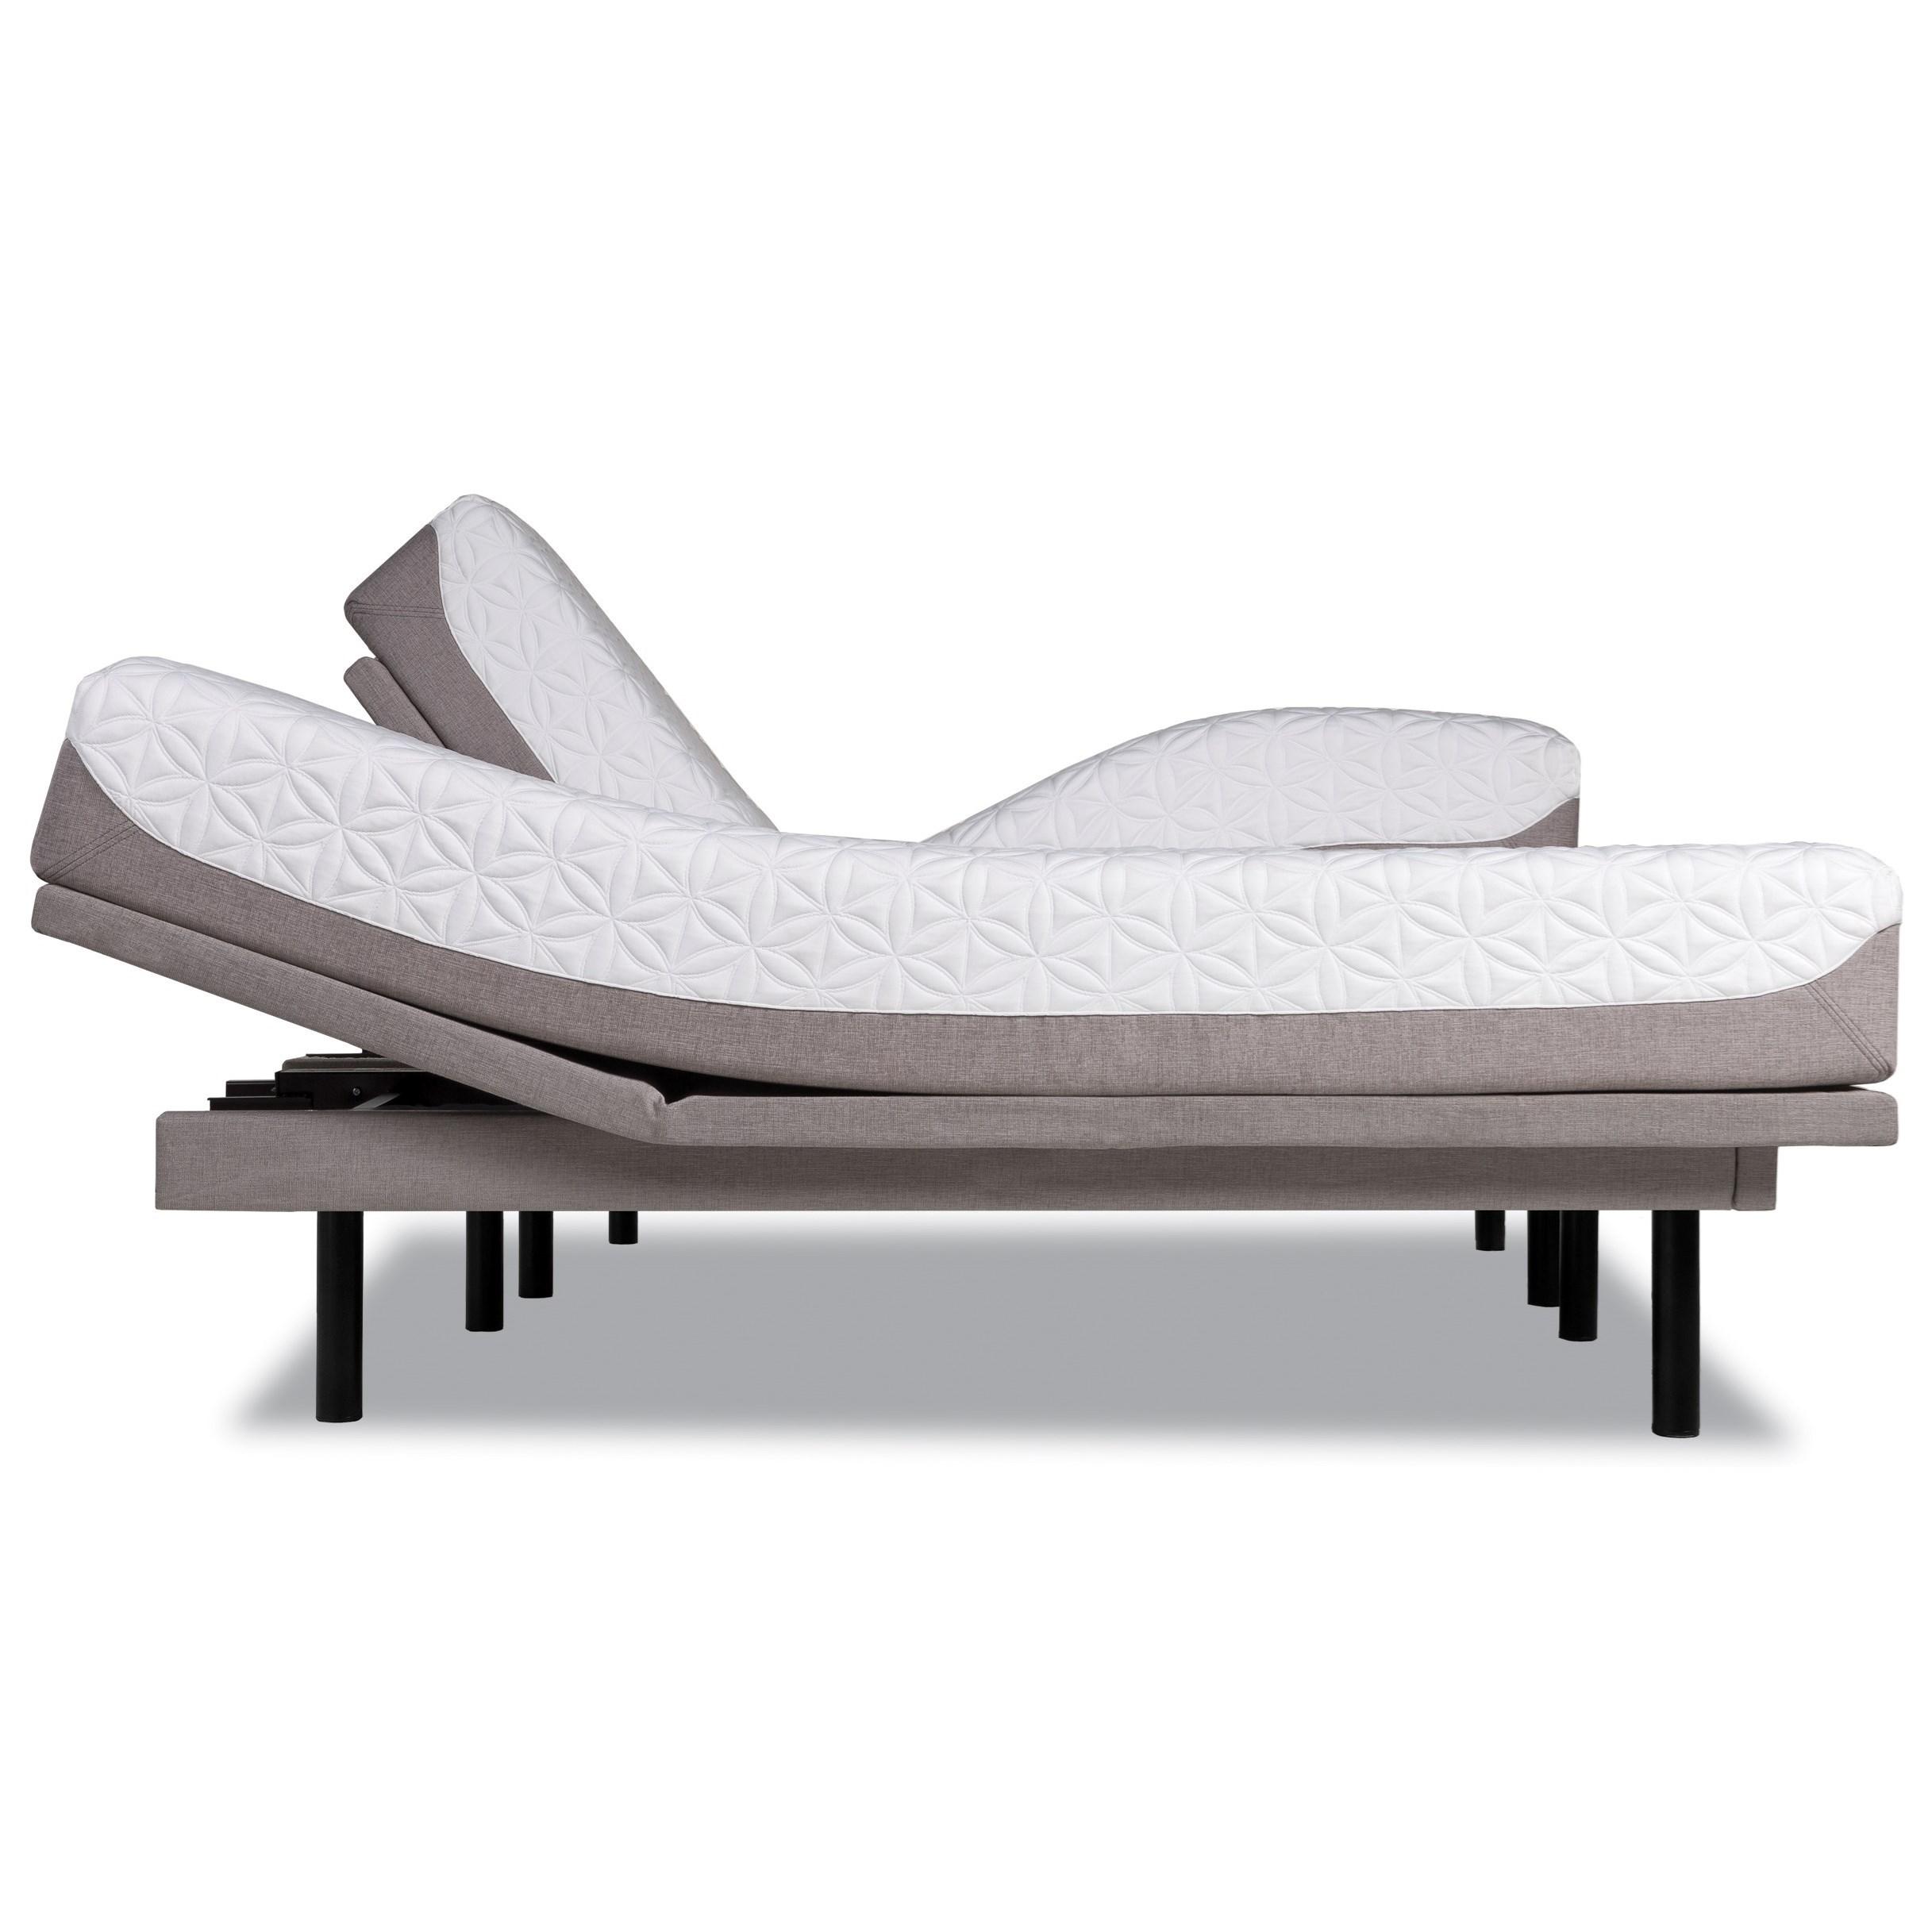 Tempur-Pedic® TEMPUR-Cloud Prima Twin Medium-Soft Mattress Set - Item Number: 10237110+25289210